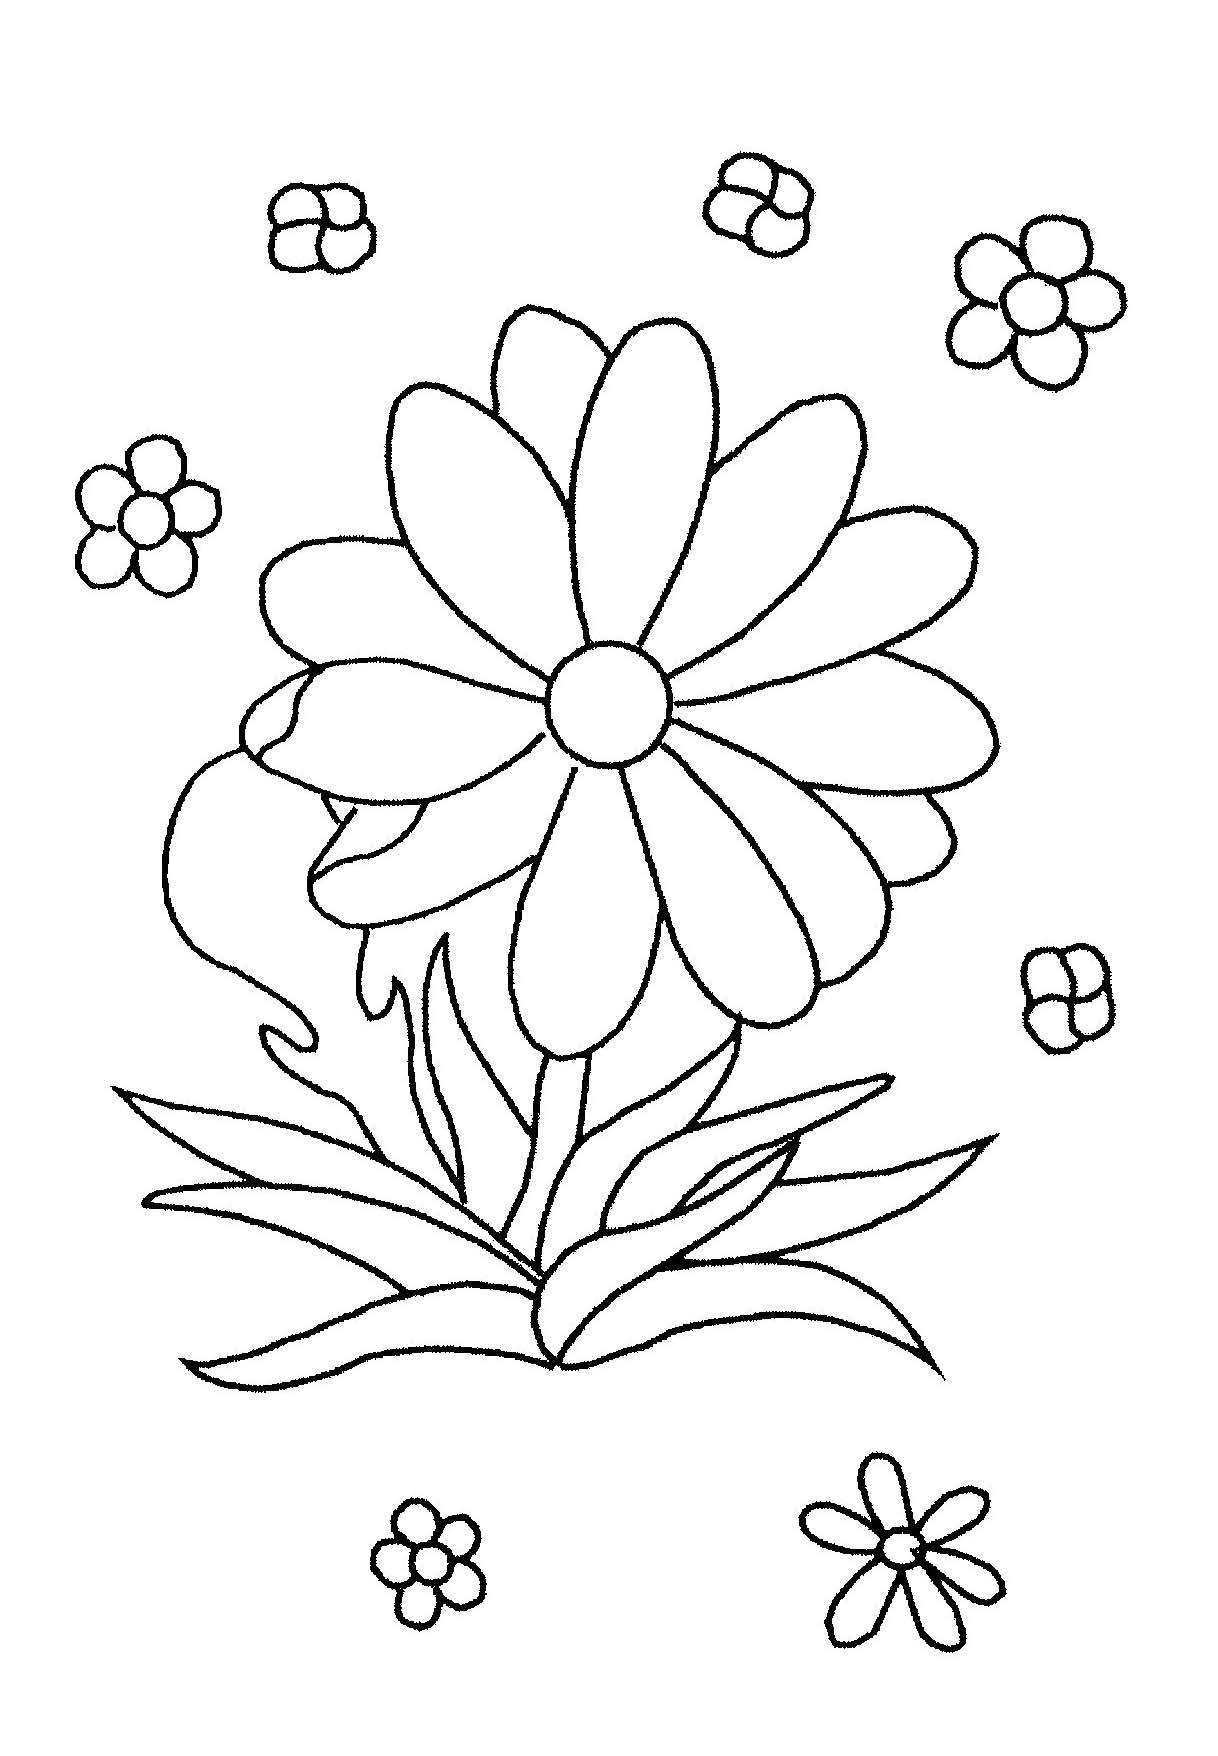 Dessin fleur capucine - Coloriage fleur capucine ...